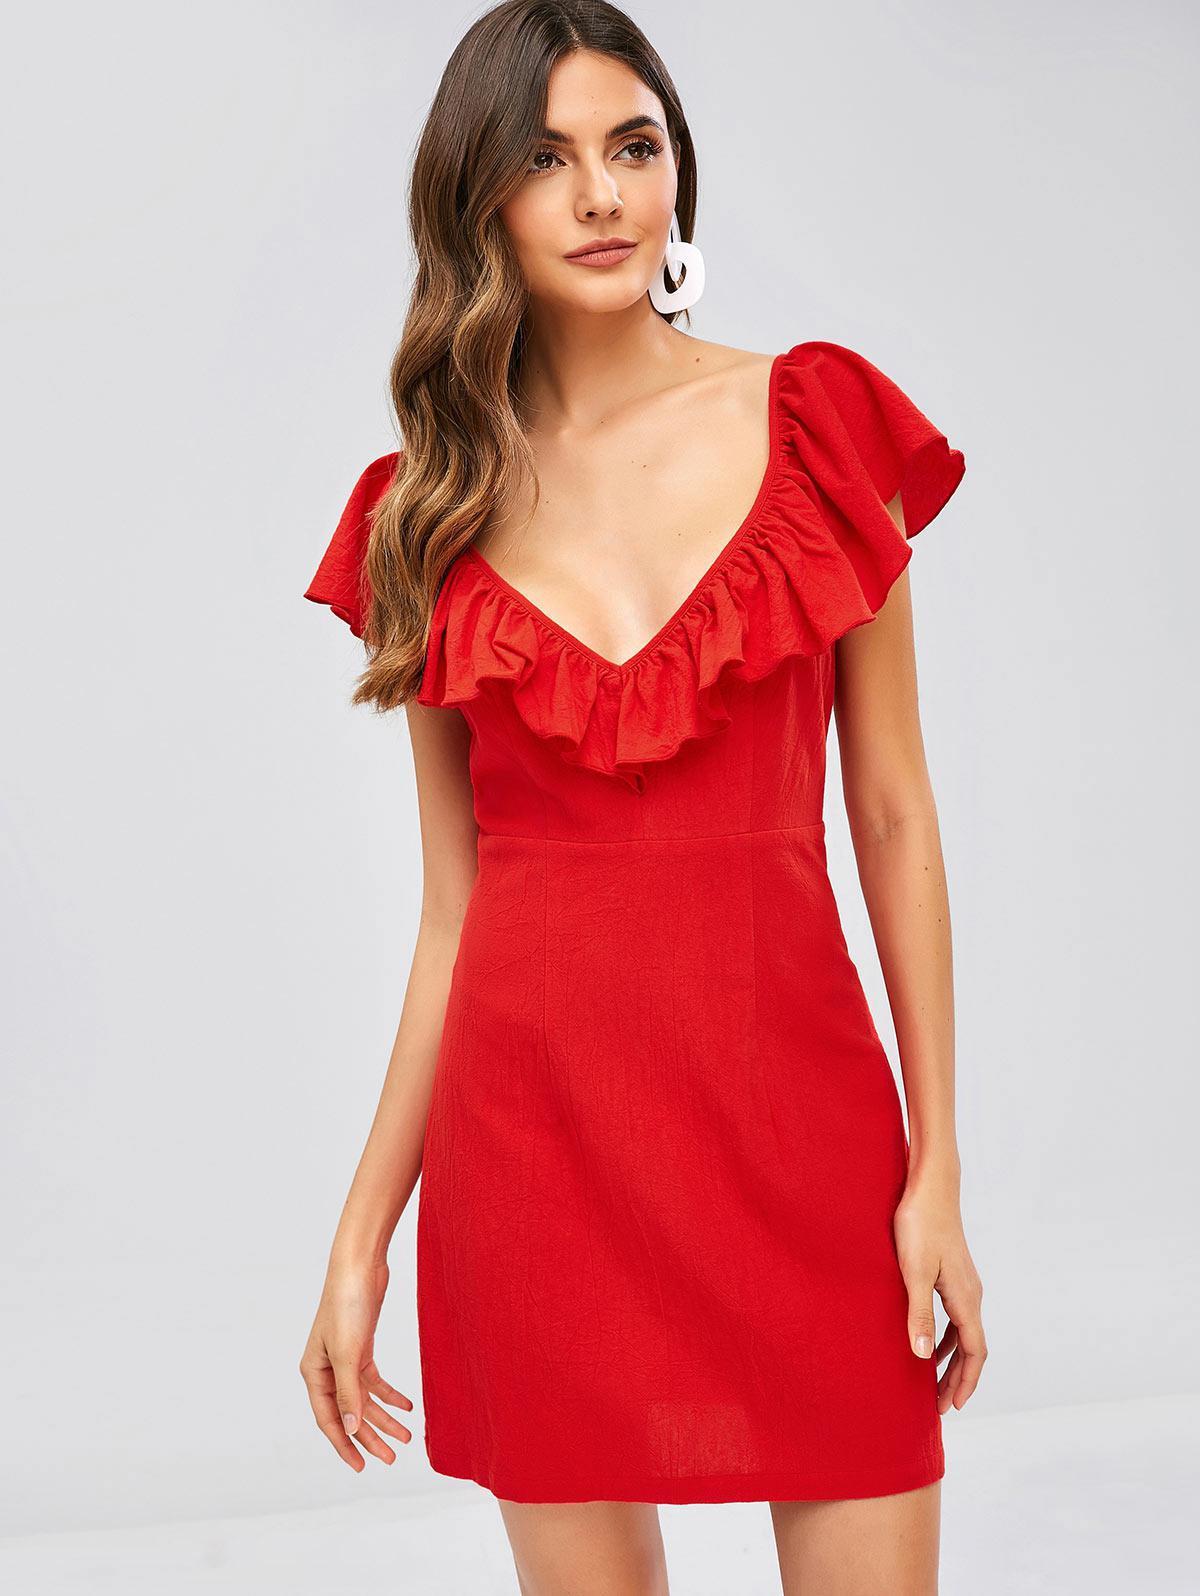 ZAFUL Criss Cross Ruffles Plain Dress, Red